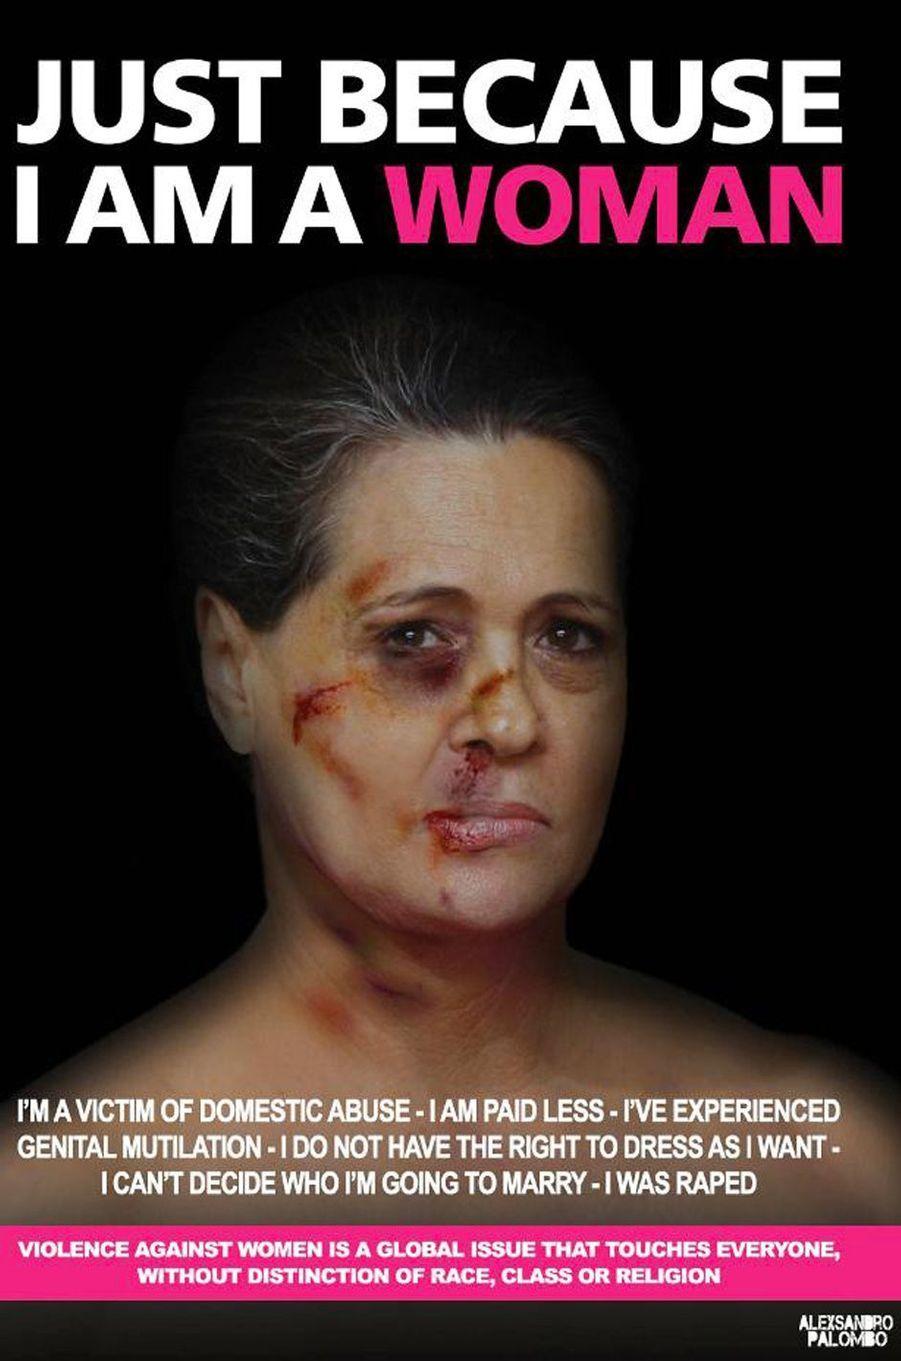 La campagne«Just because I am a Woman» de l'artisteAleXsandro Palombo. IciSonia Gandhi.